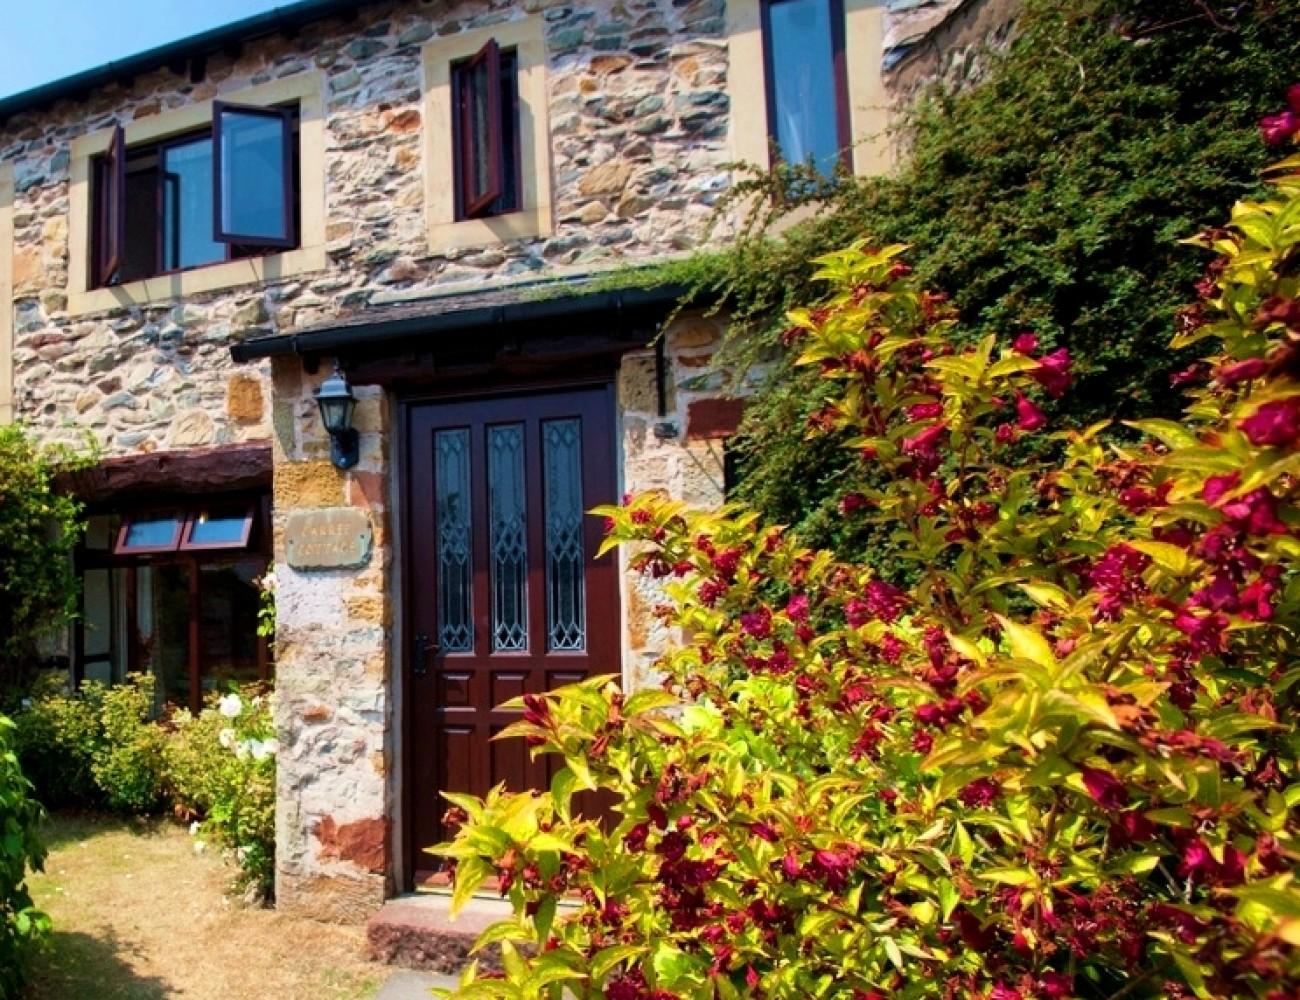 Carree cottage unique holiday cottages for Unique holiday cottages